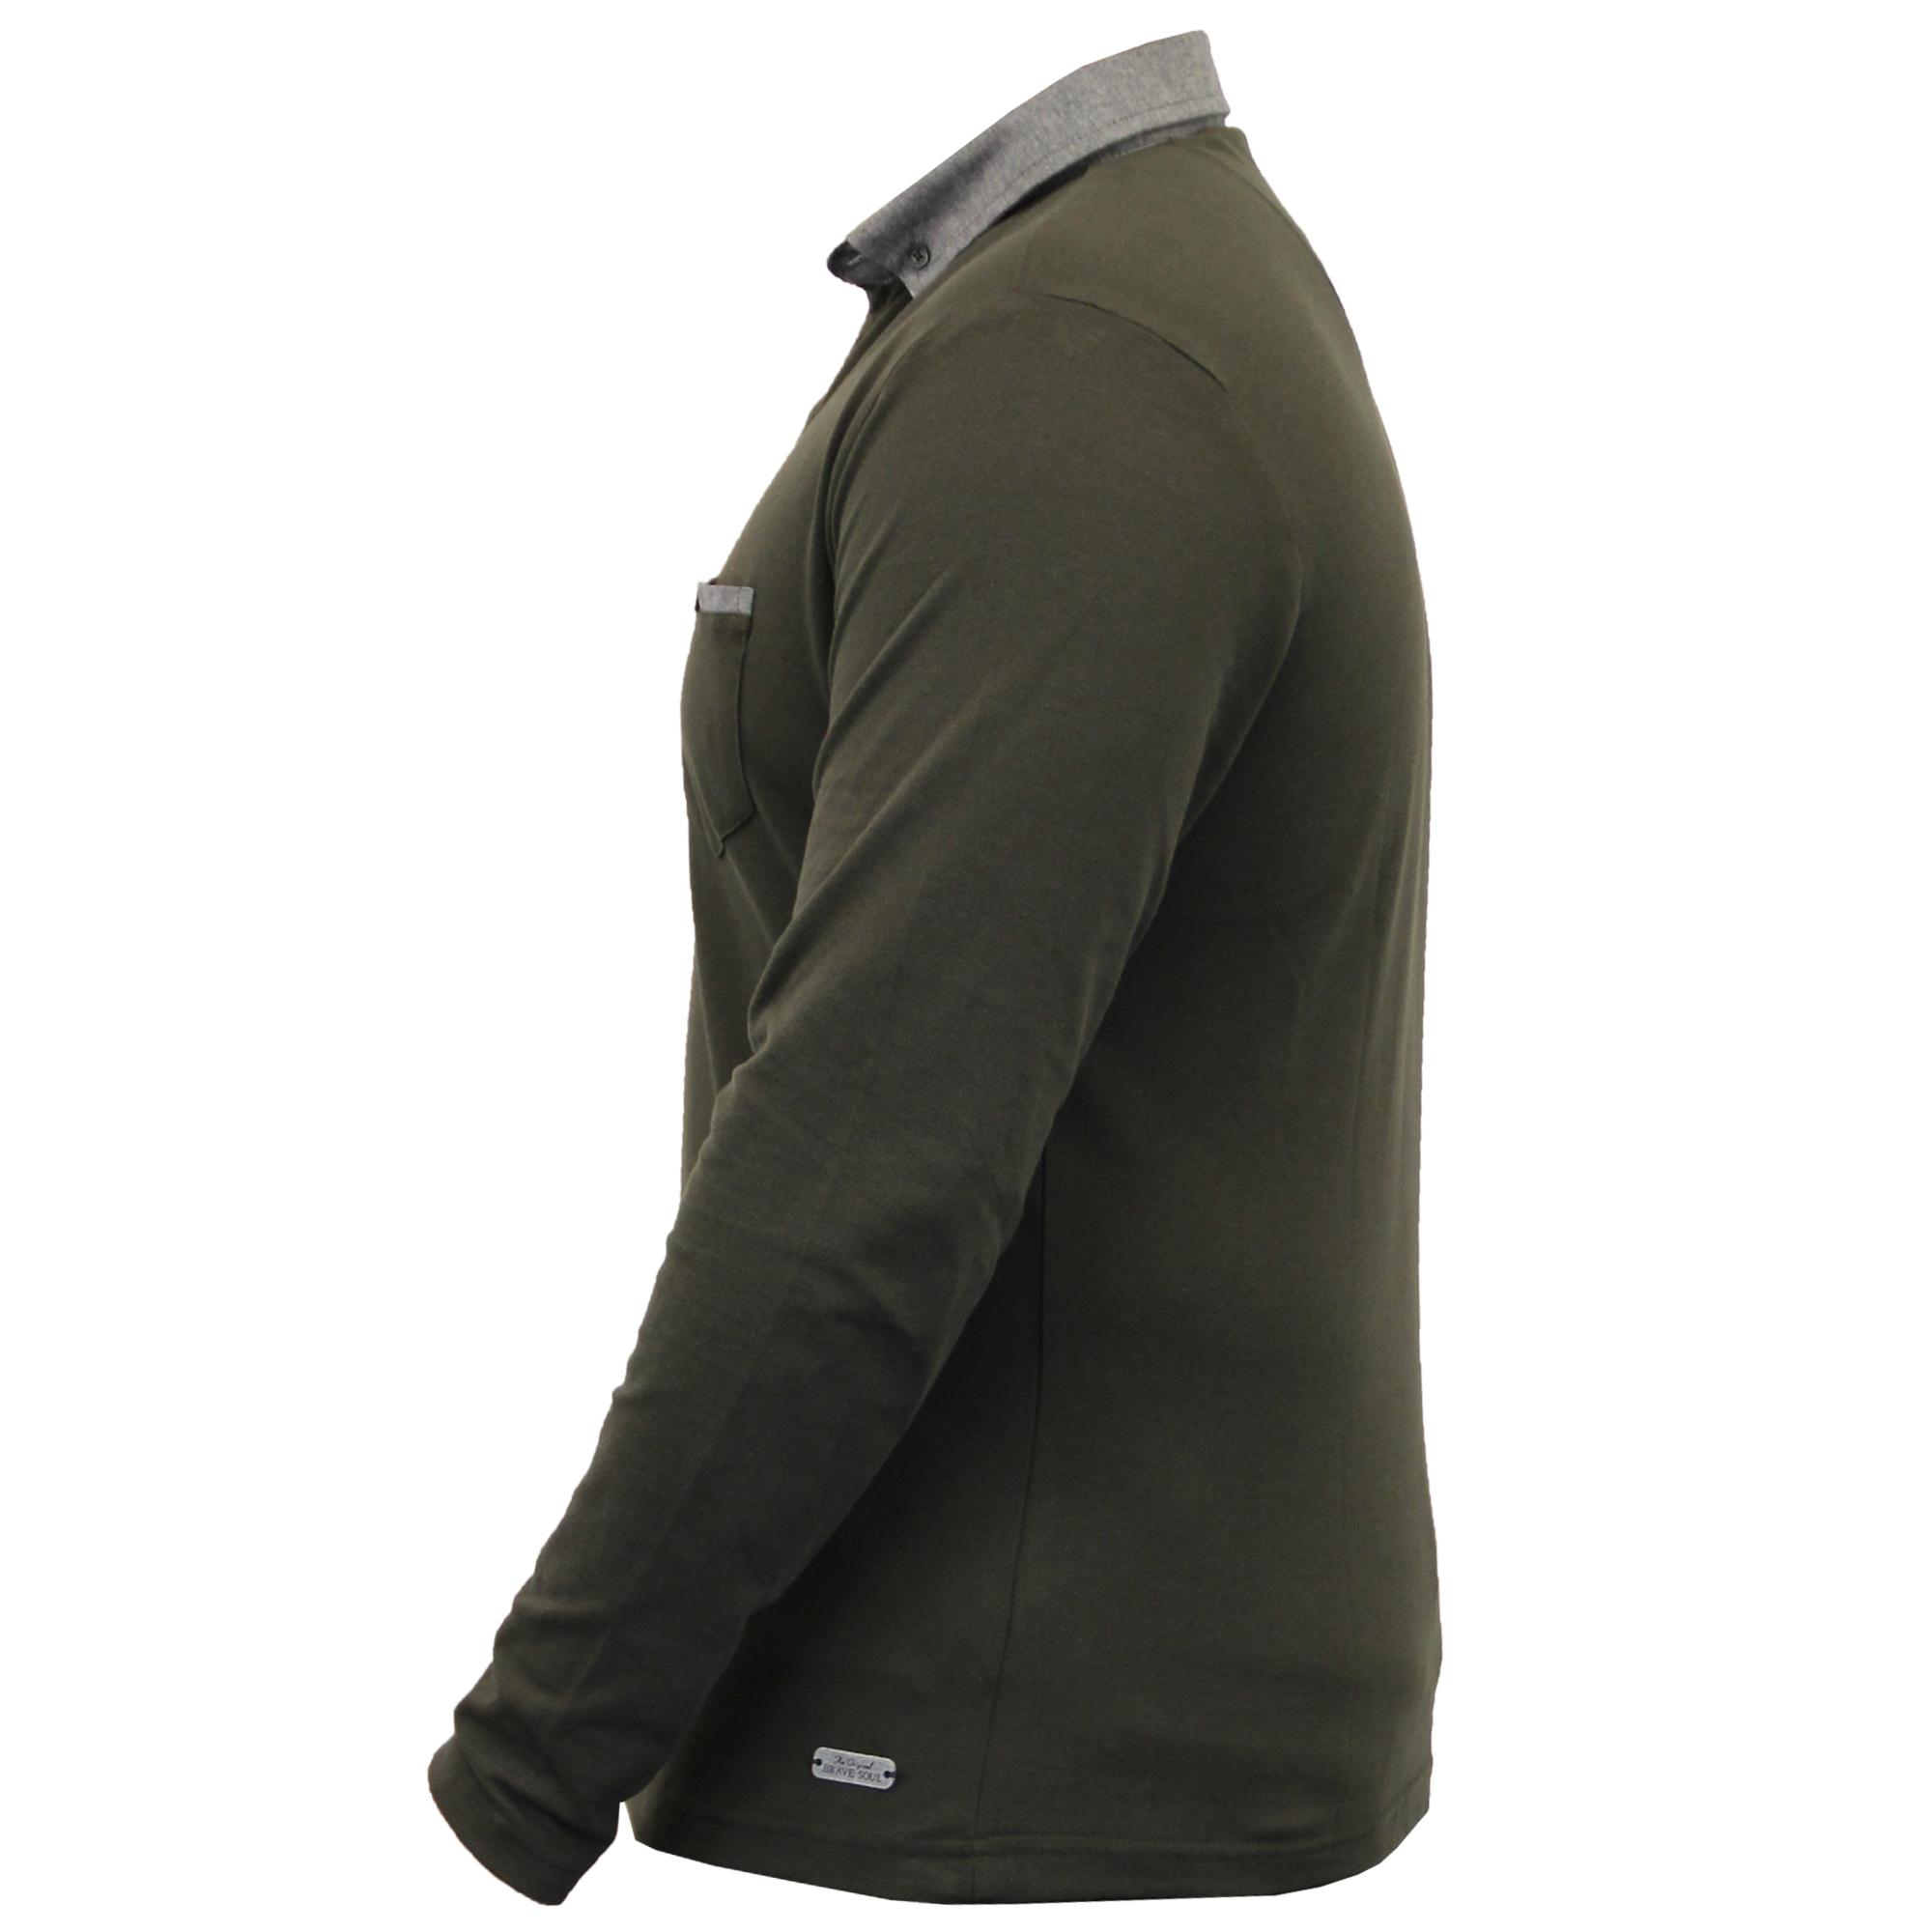 Homme-a-Manches-Longues-Jersey-Top-Brave-Soul-Pique-Polo-T-Shirt-A-Col-Ete-Neuf miniature 19